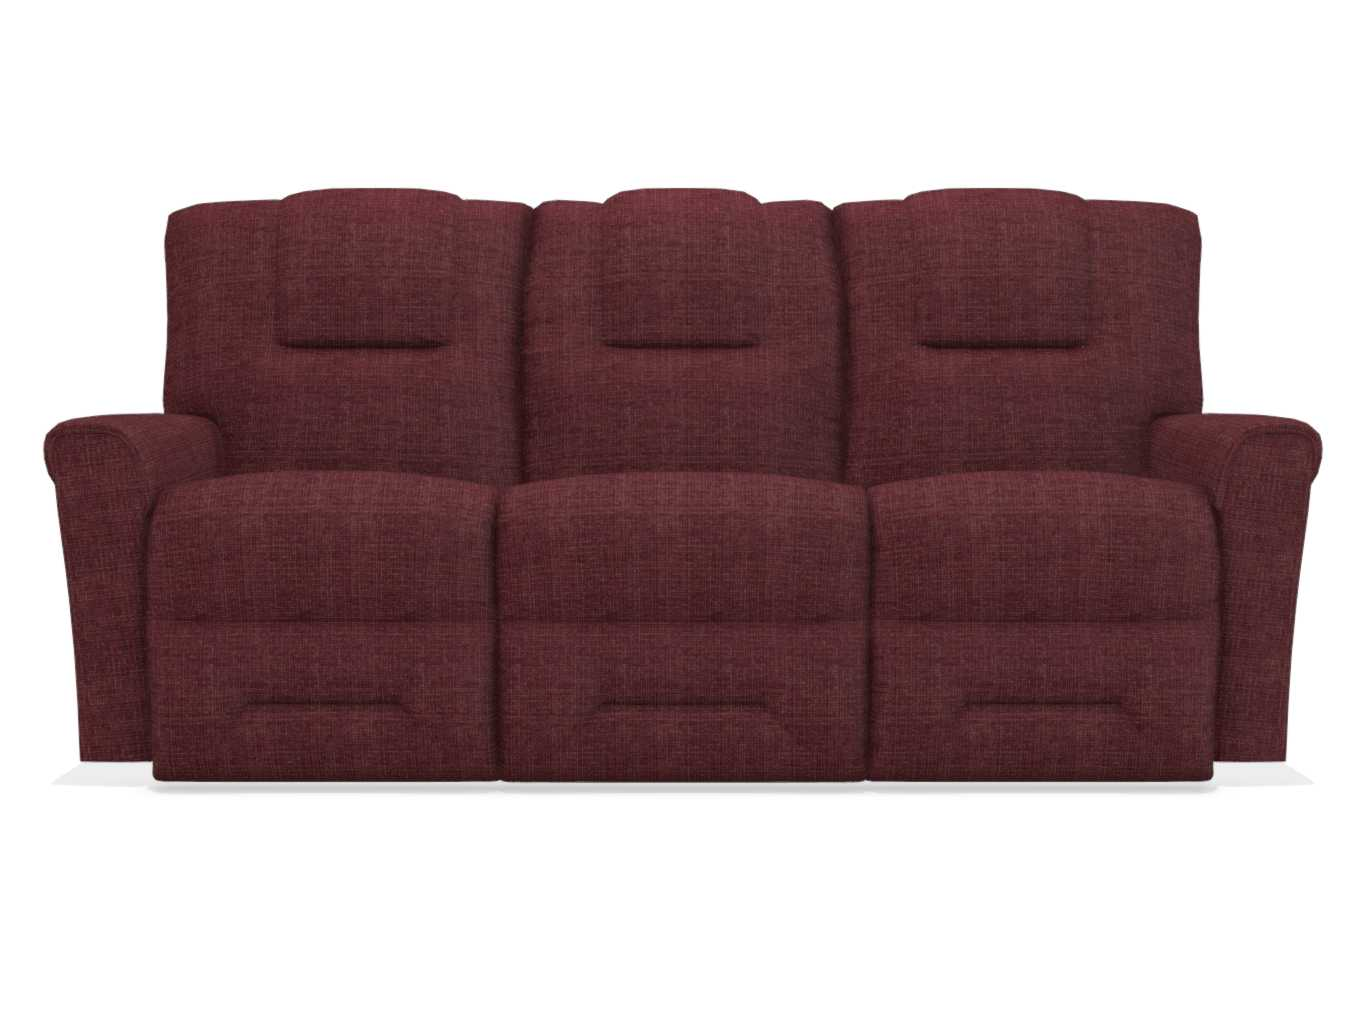 Sofá reclinableEaston